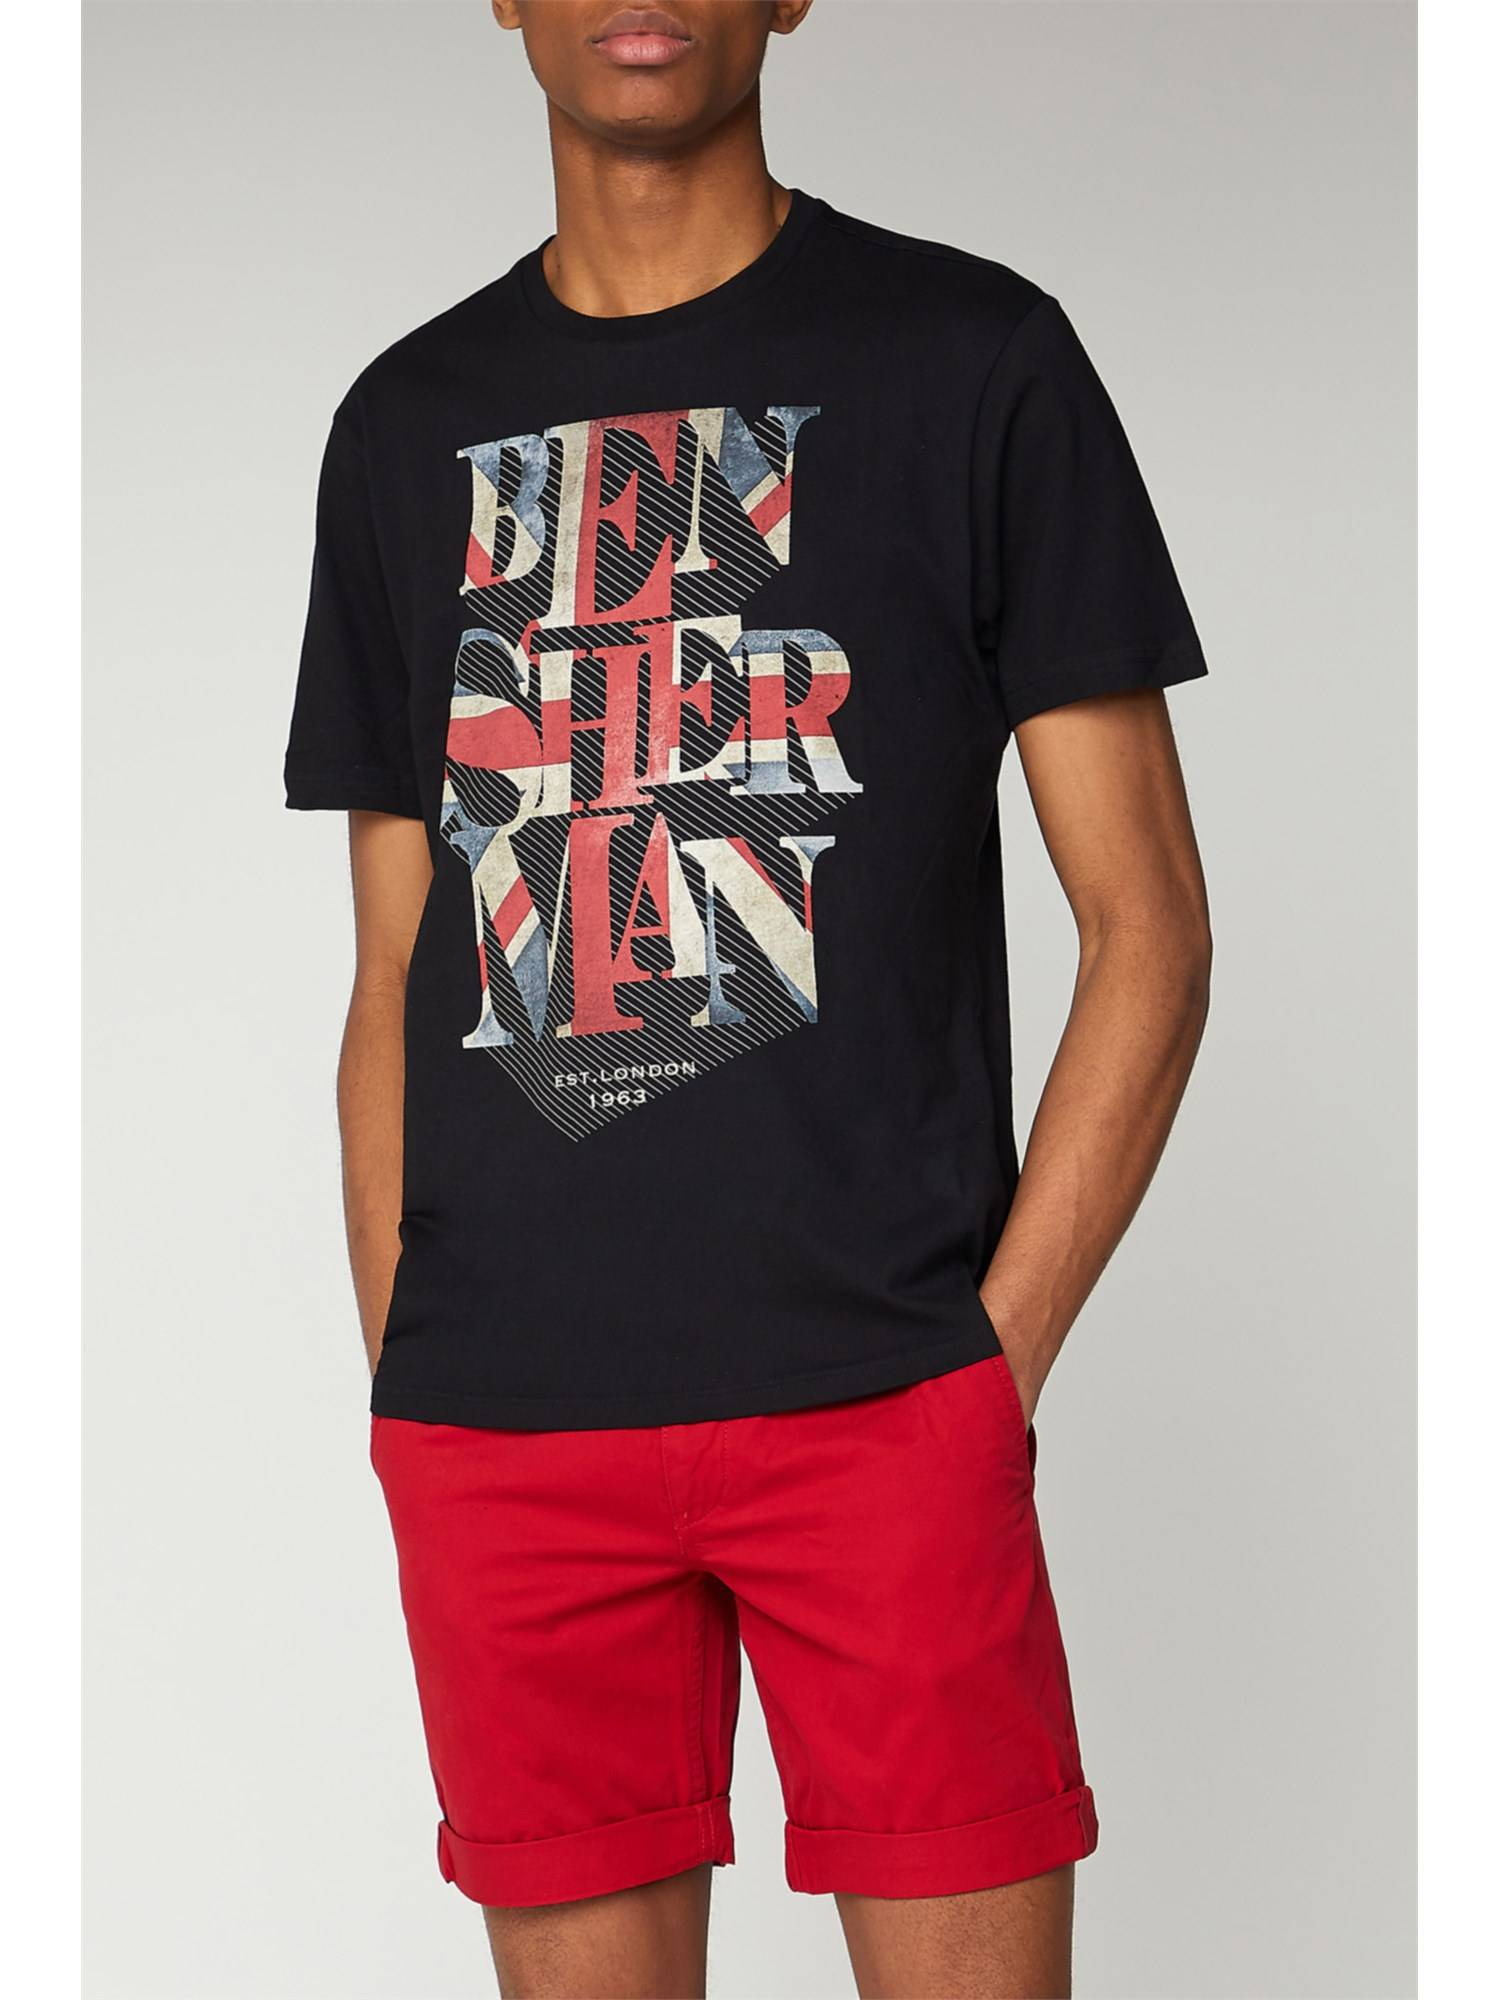 Ben Sherman Union Jack Graphic T-Shirt XS Black